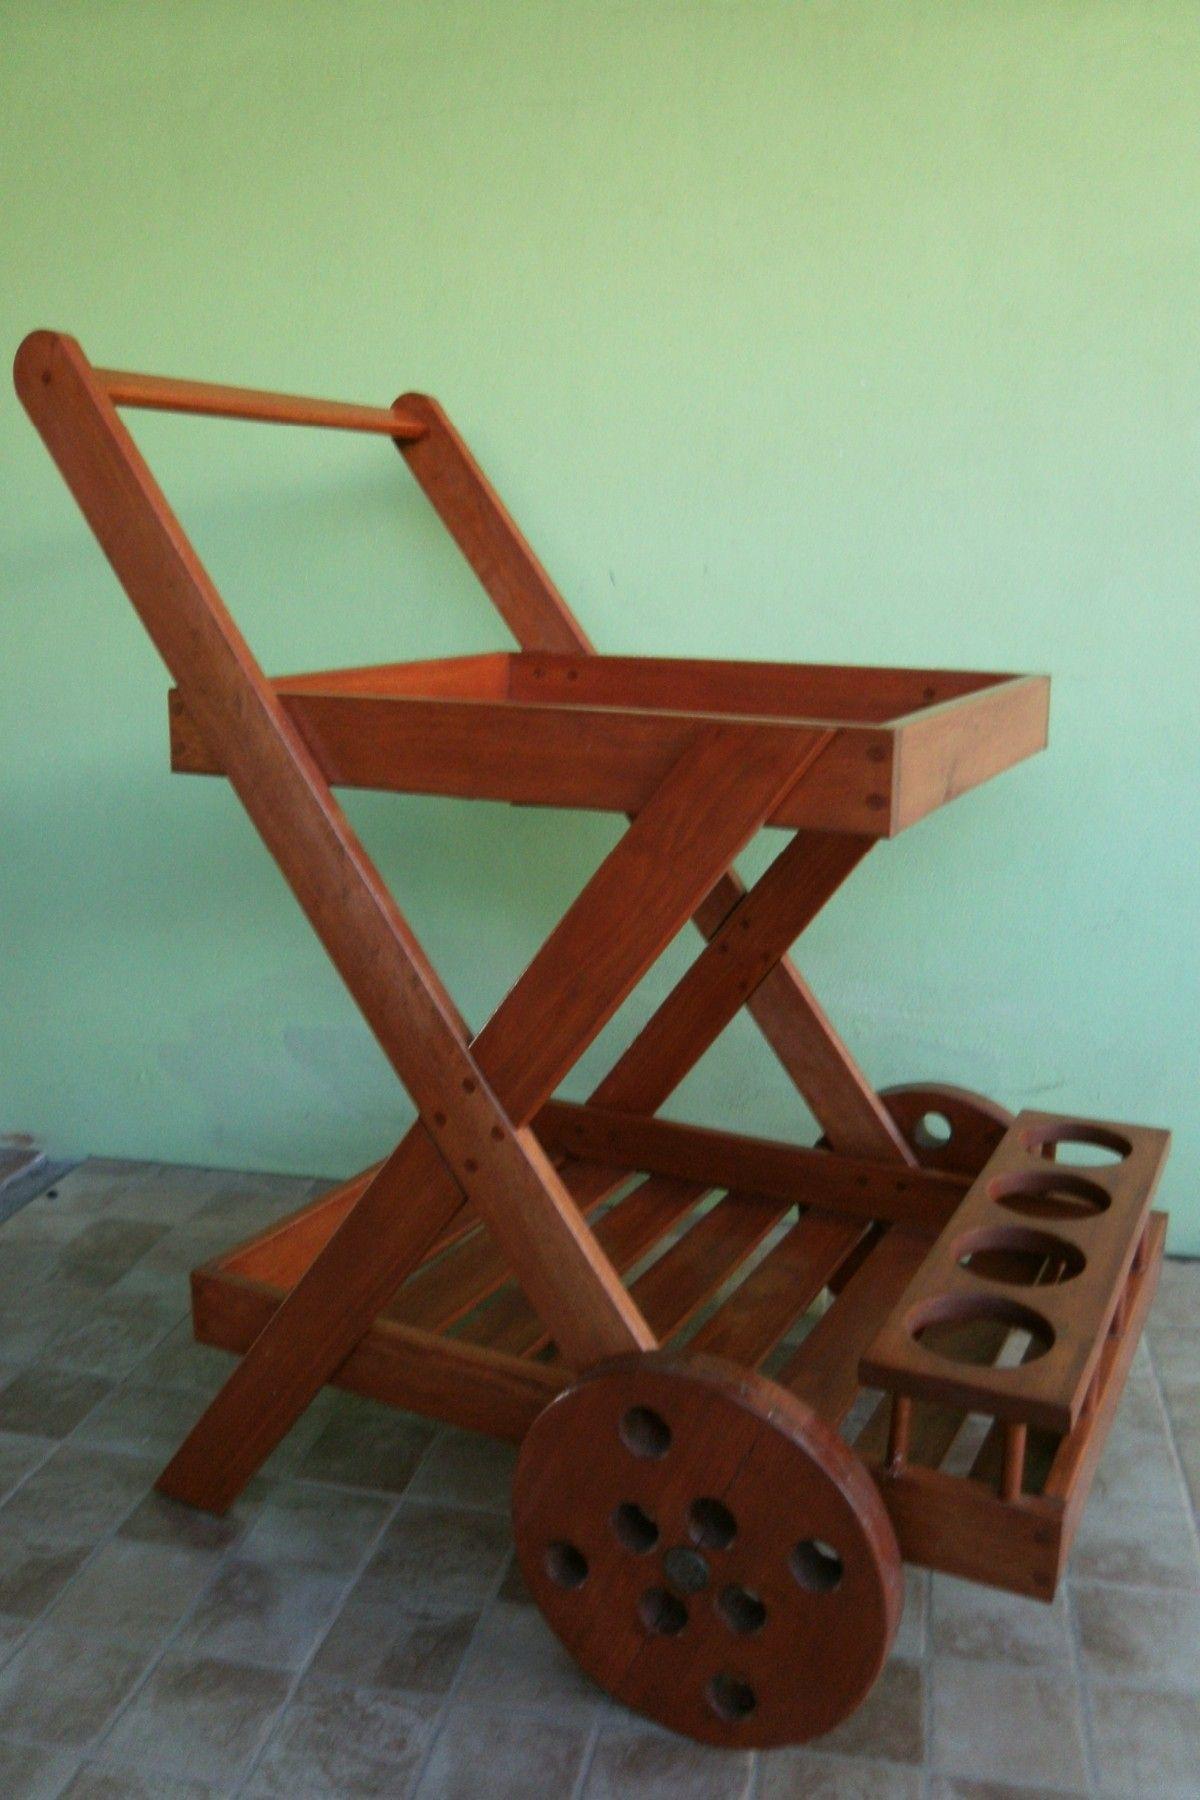 Vendo carrito bar de madera hogar muebles y jard n for Carritos de madera para jardin